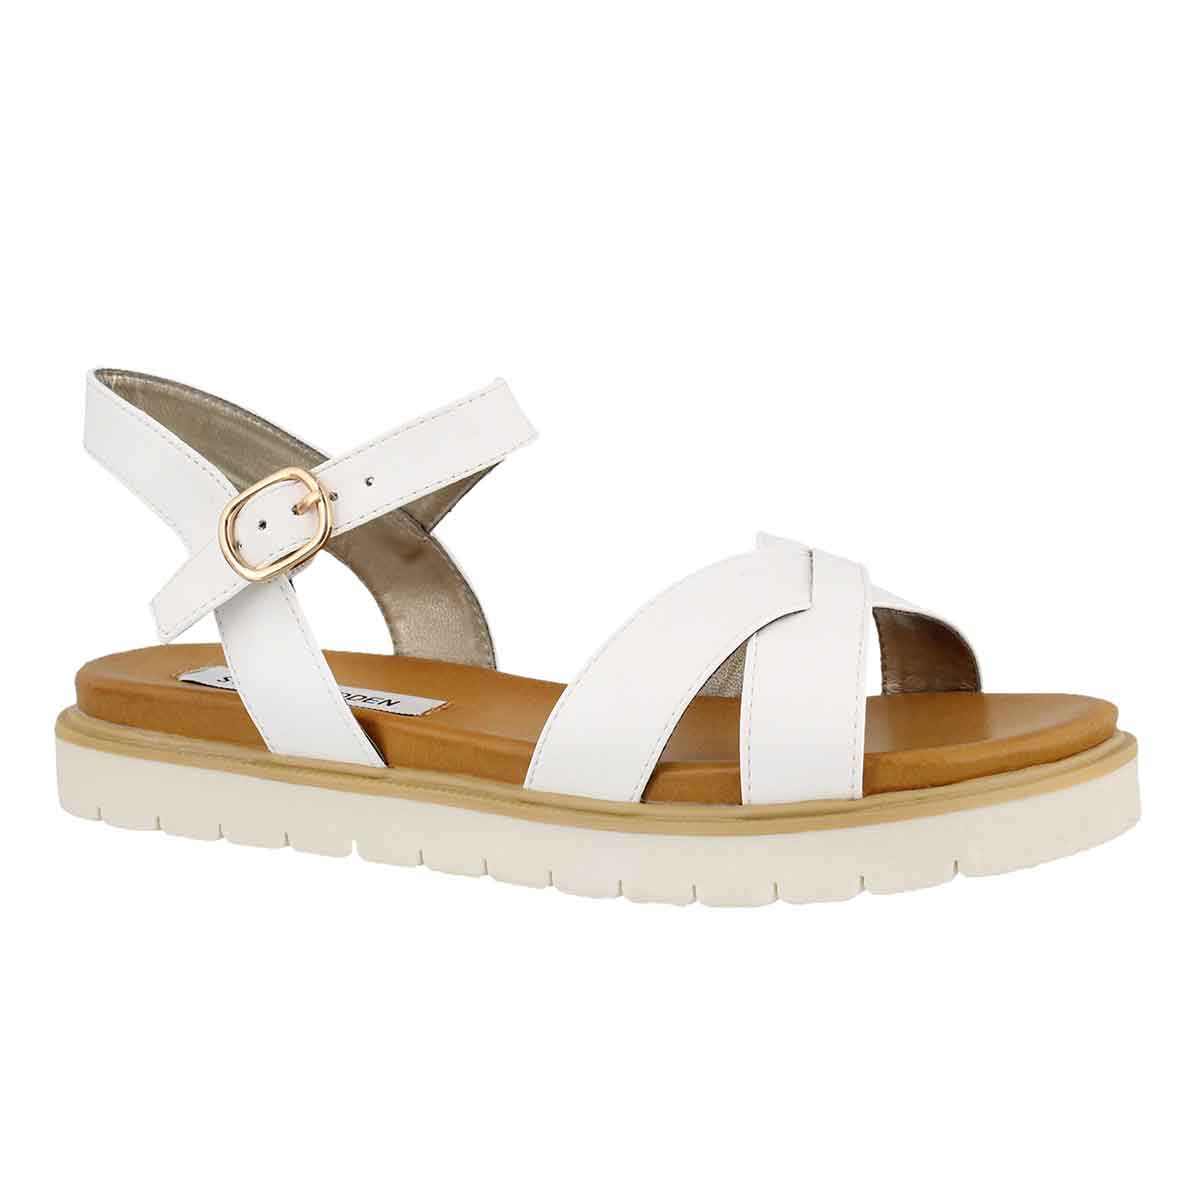 Women's FRANCOIS white casual sandals